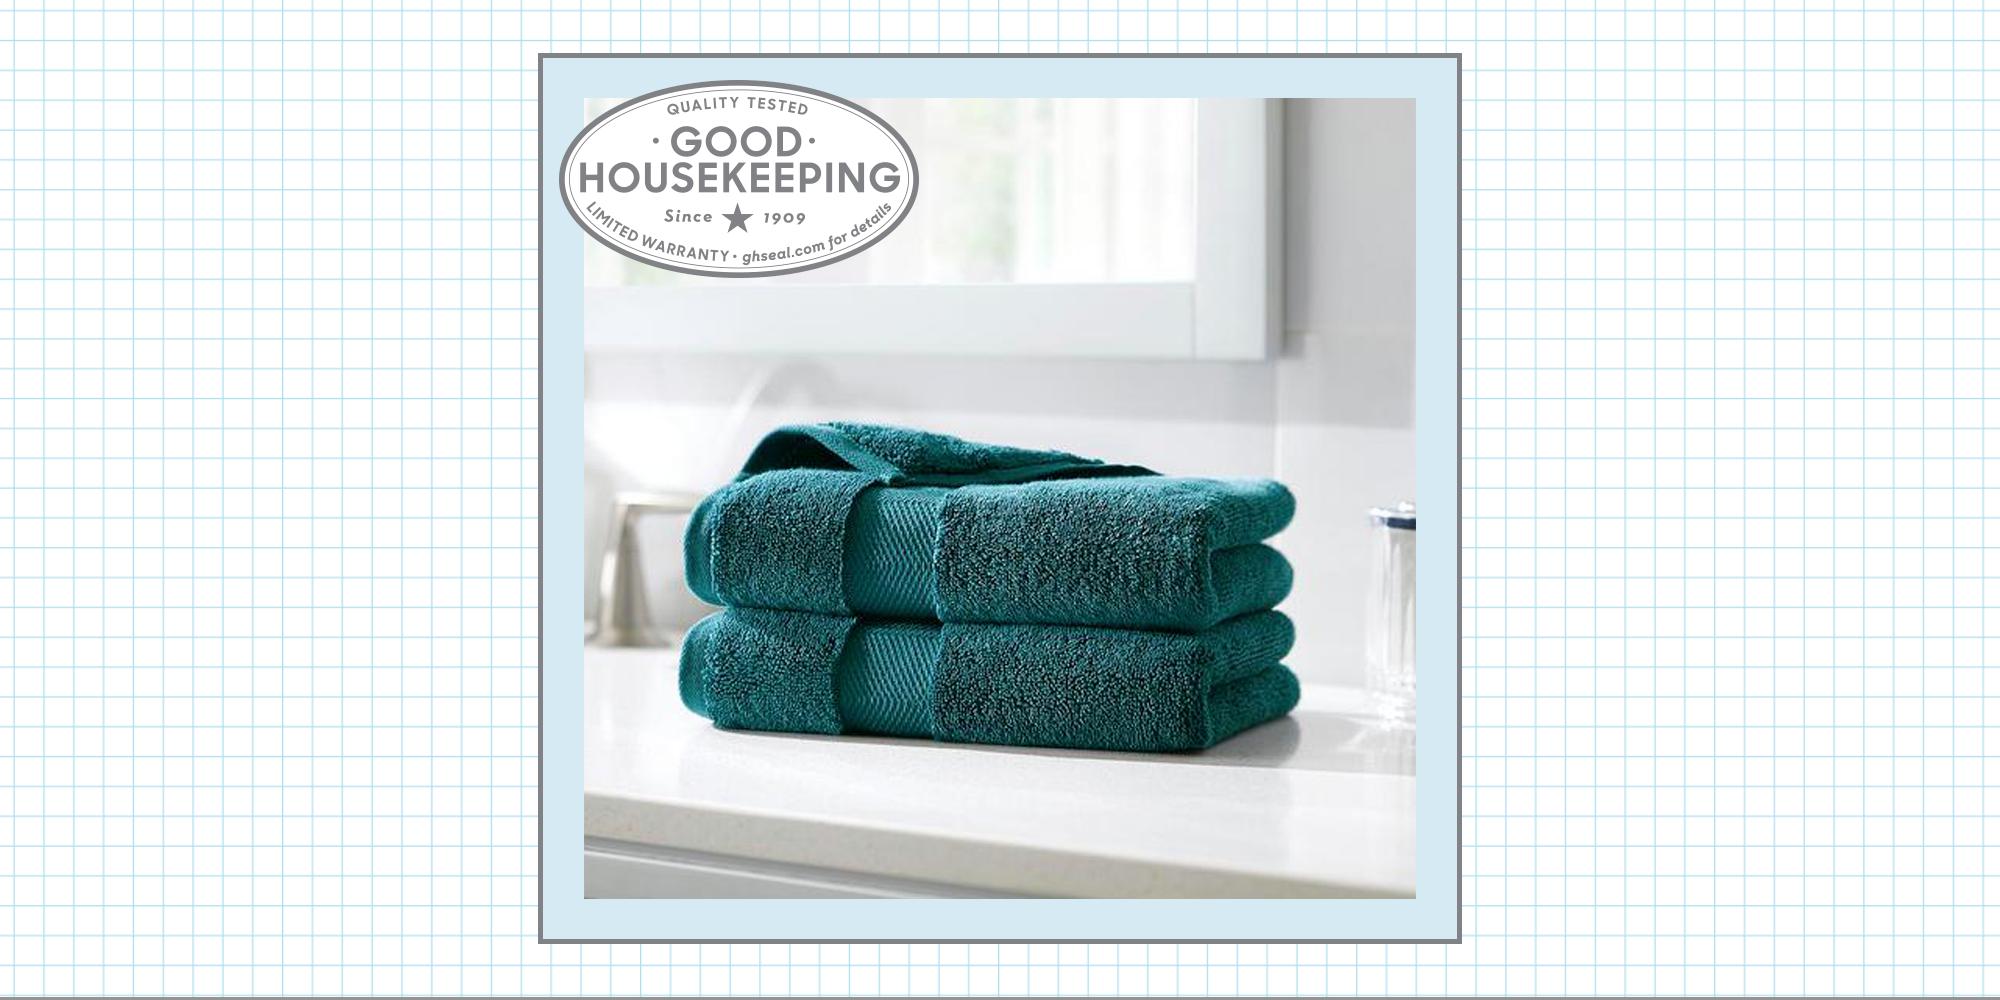 GH Seal Spotlight: The Home Decorators Collection Plush Soft Cotton Bath Towel